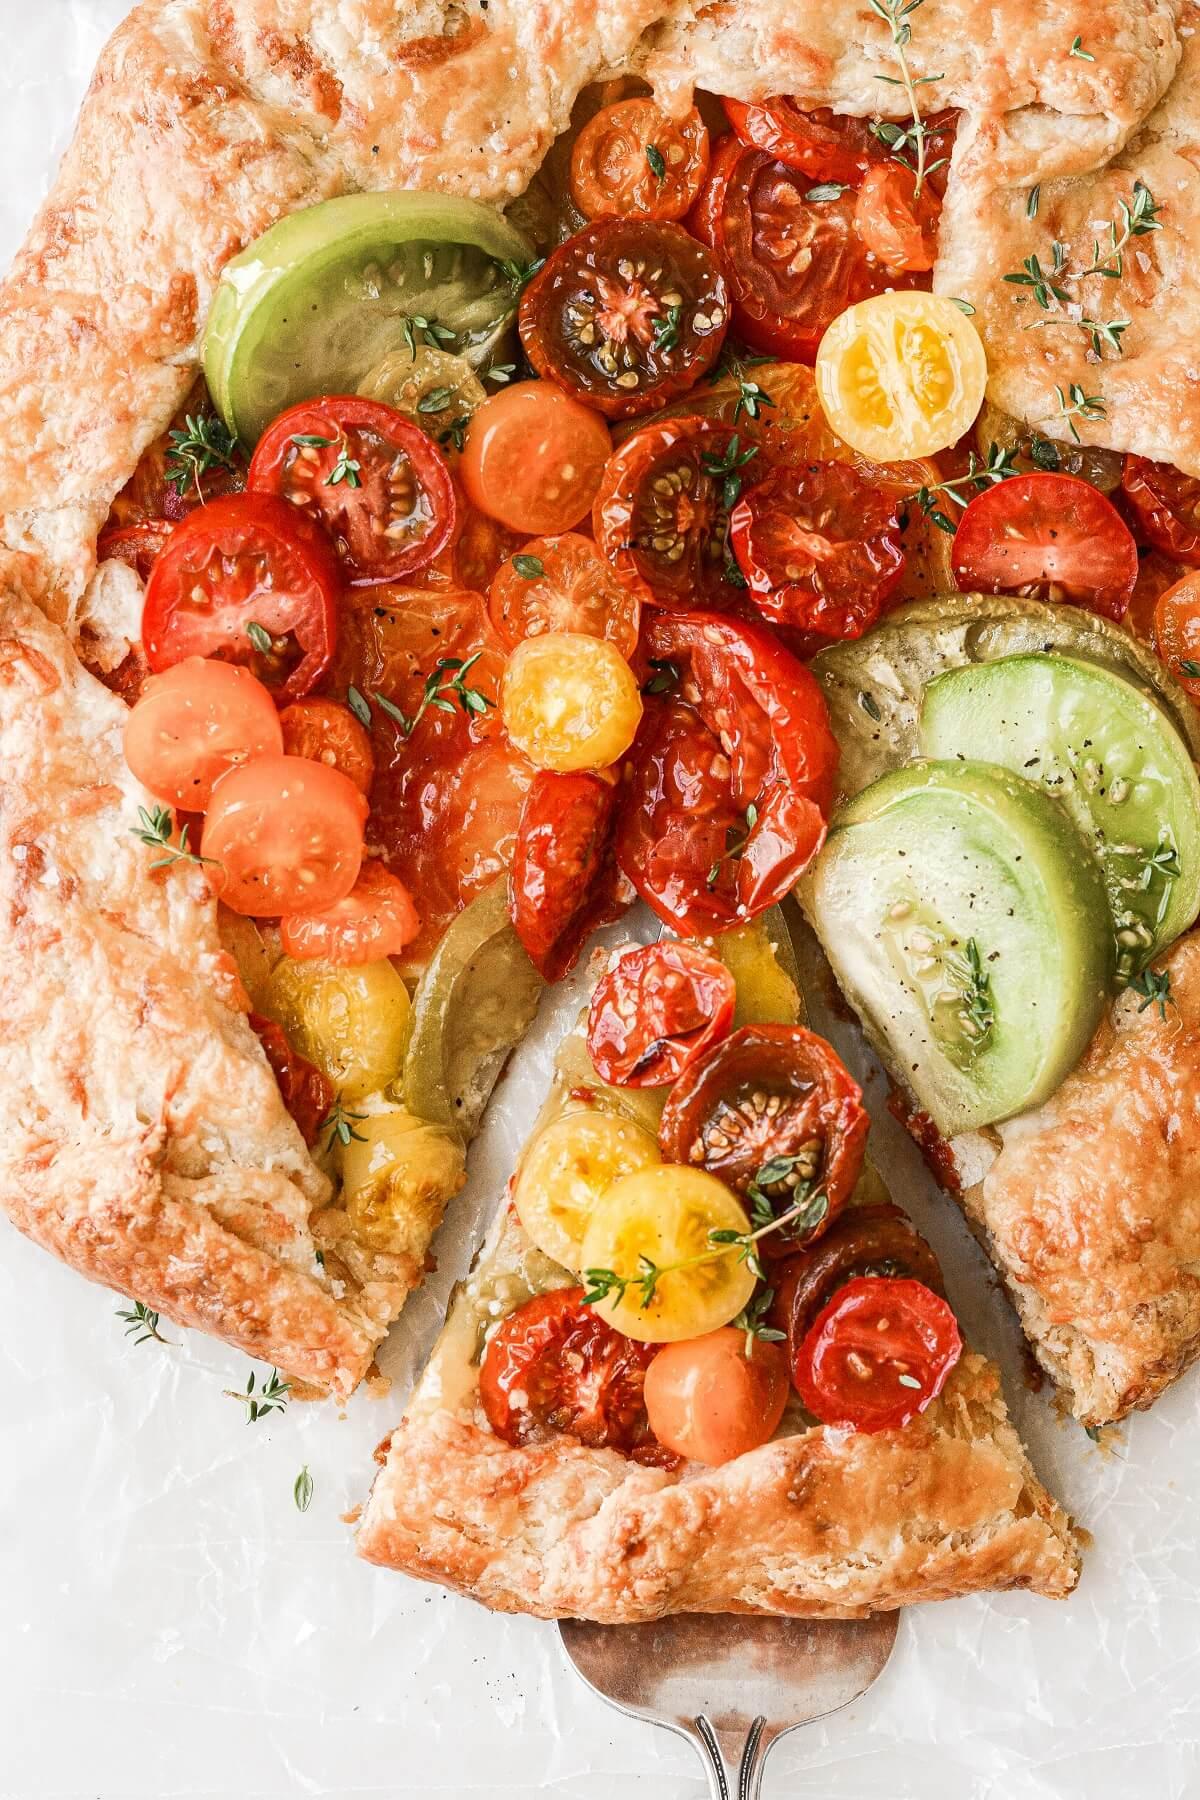 A slice of tomato galette on a pie server.